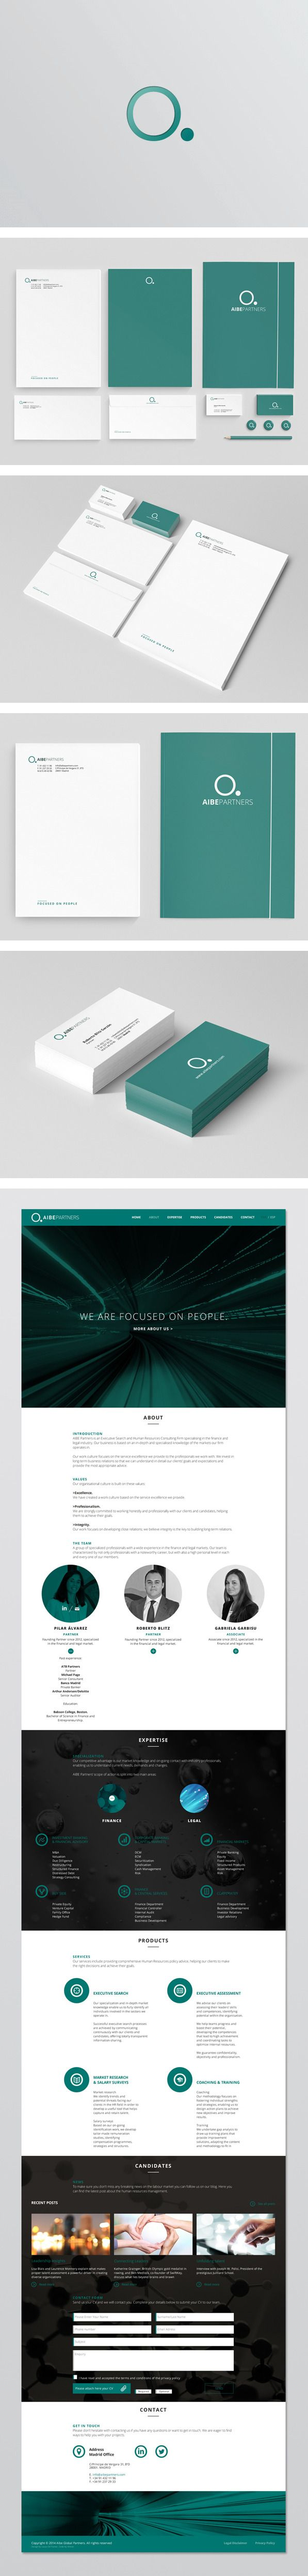 Aibe Partners identity